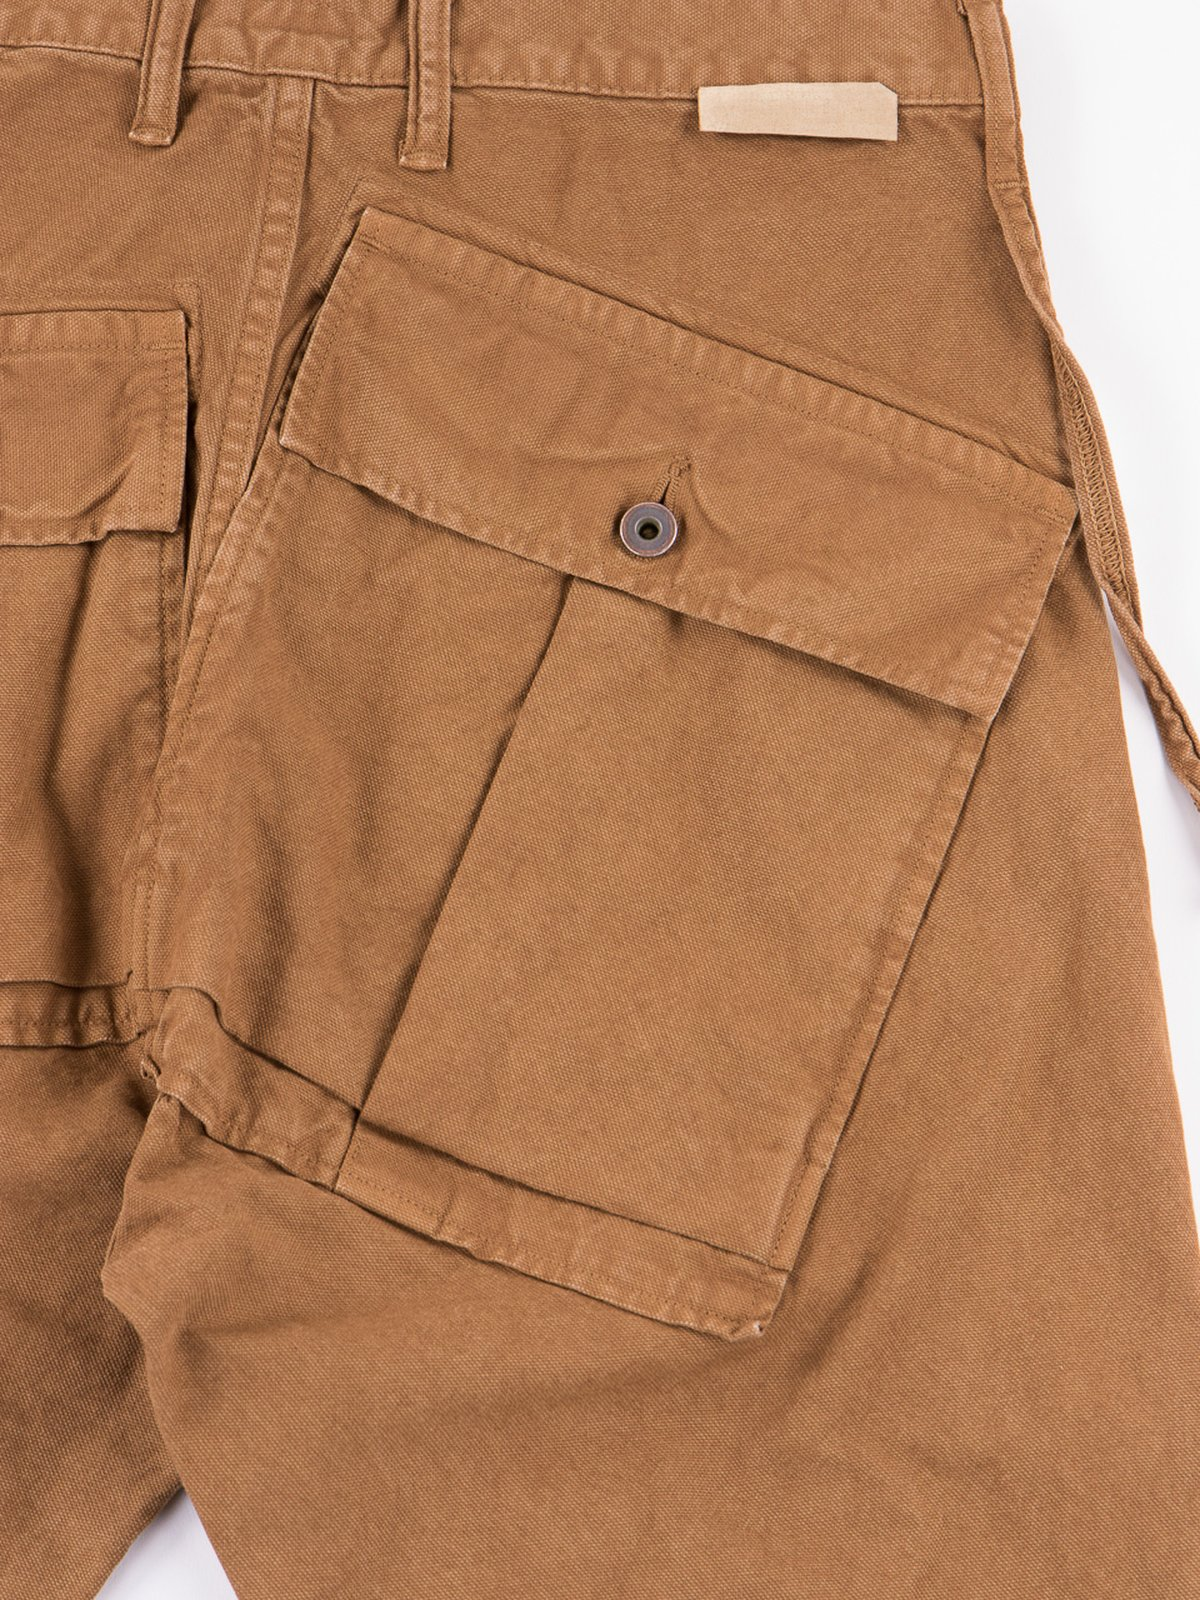 Gold Light Canvas Ringo Man Cargo Pant - Image 5